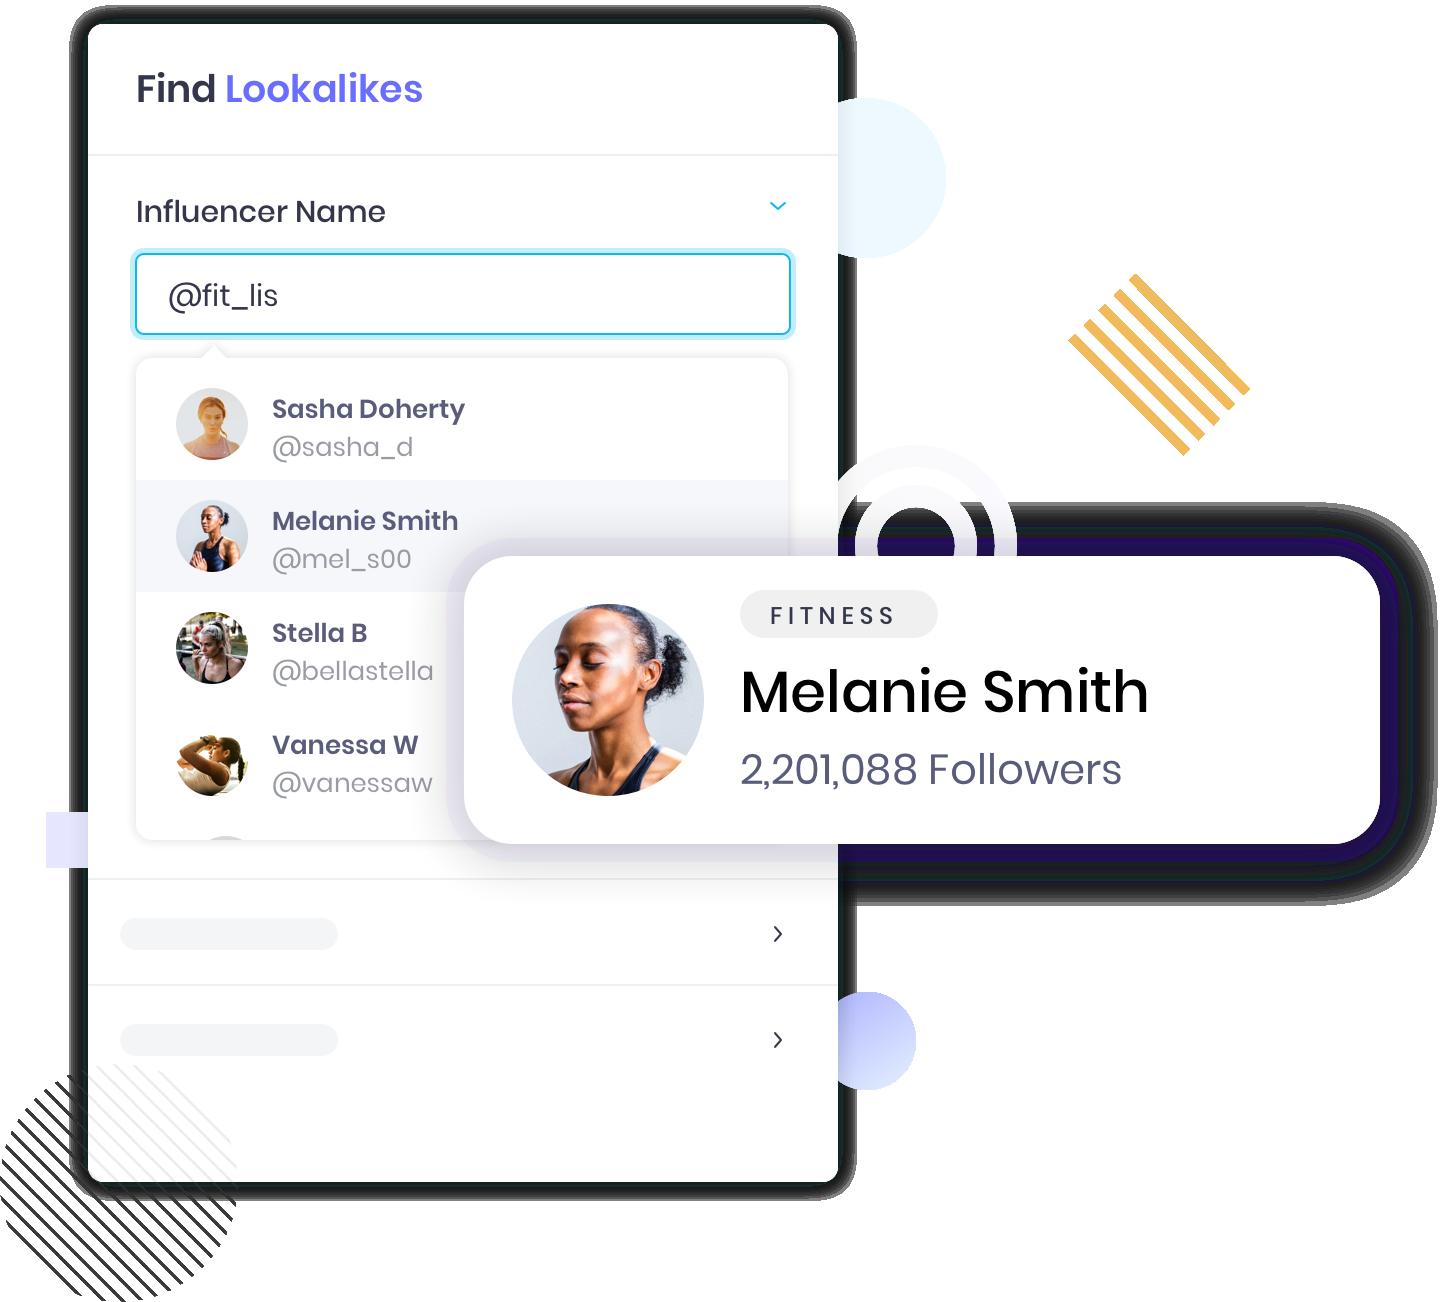 find influencer lookalike tool